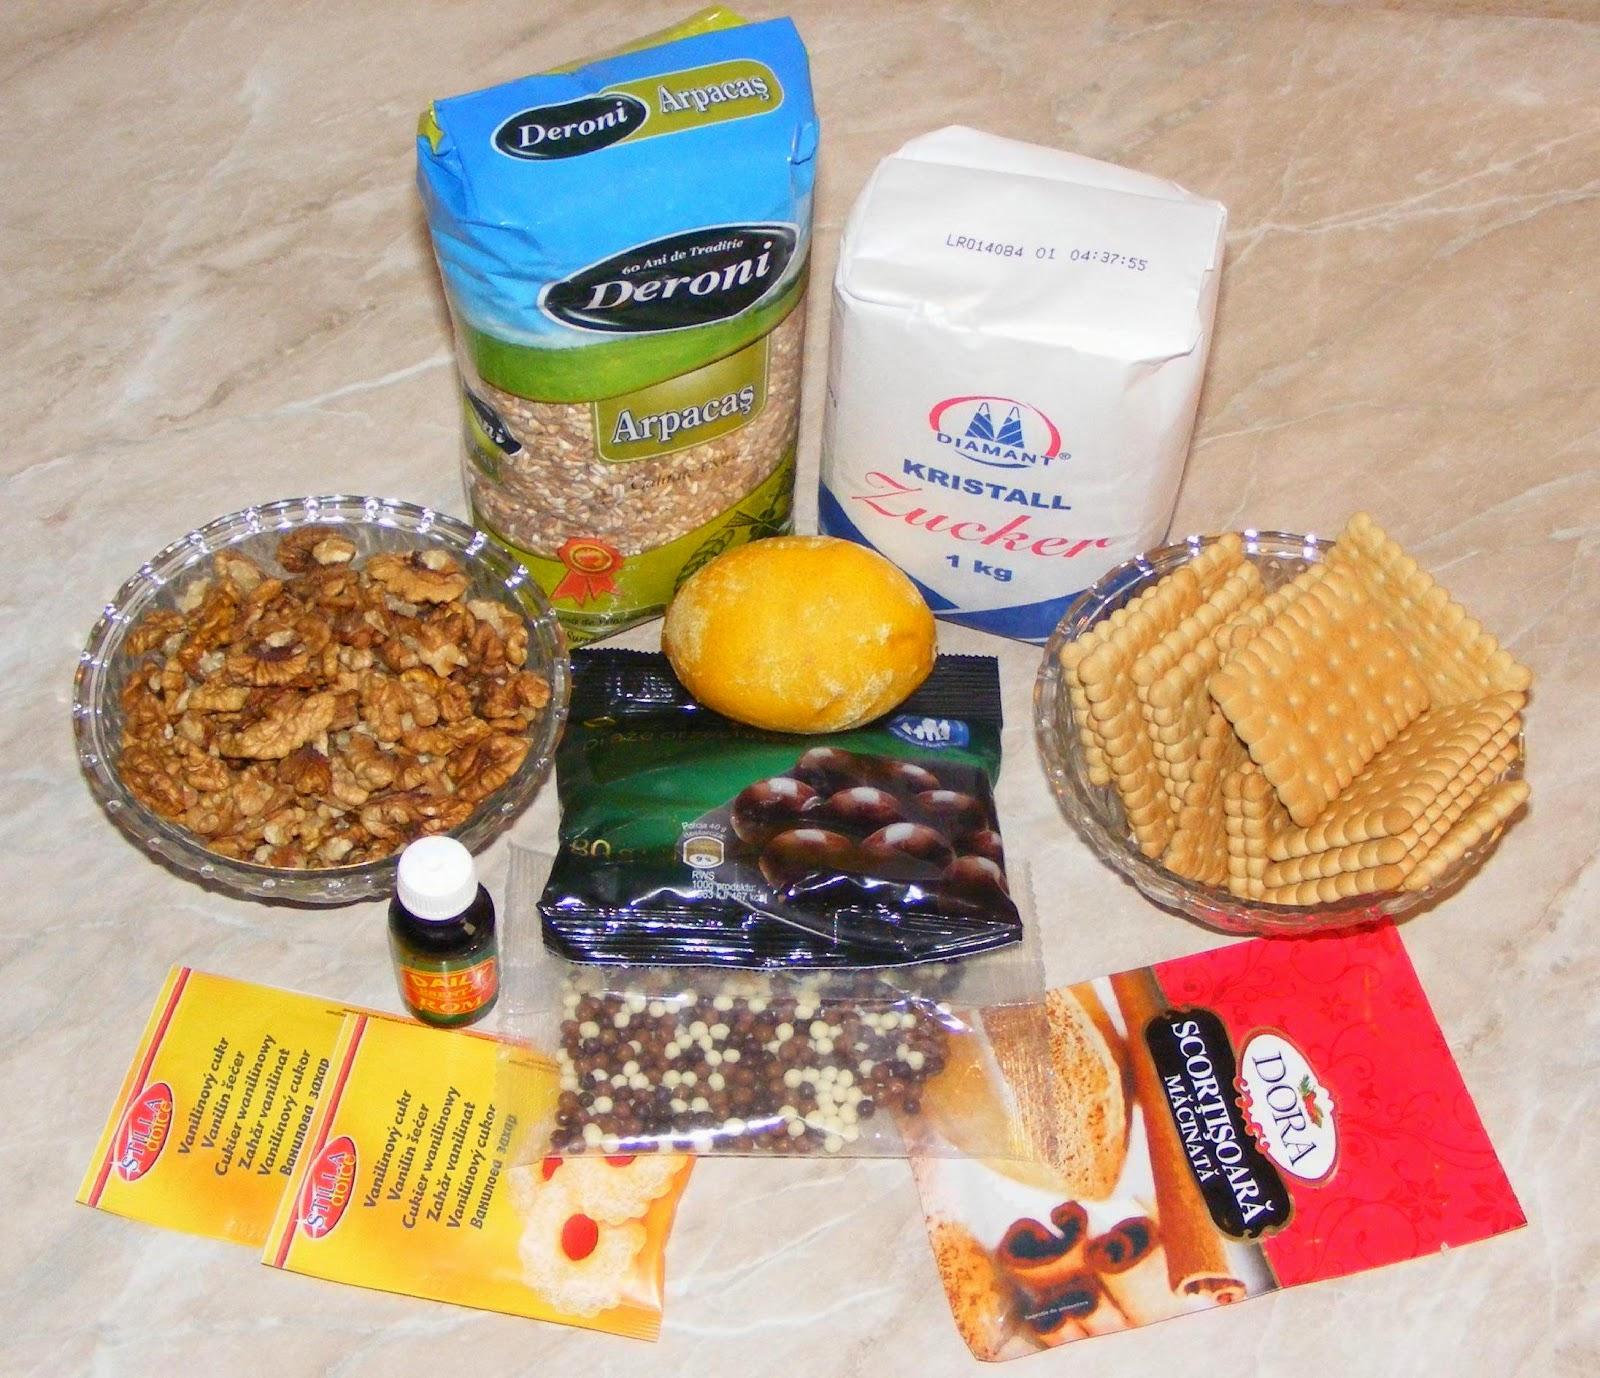 ingrediente pentru colica, cum se face coliva, cum se prepara coliva, cum facem coliva, retete si preparate culinare coliva din arpacas, reteta coliva cu arpacas, retete cu arpacas, retete dulciuri, retete prajituri, retete cu nuca,